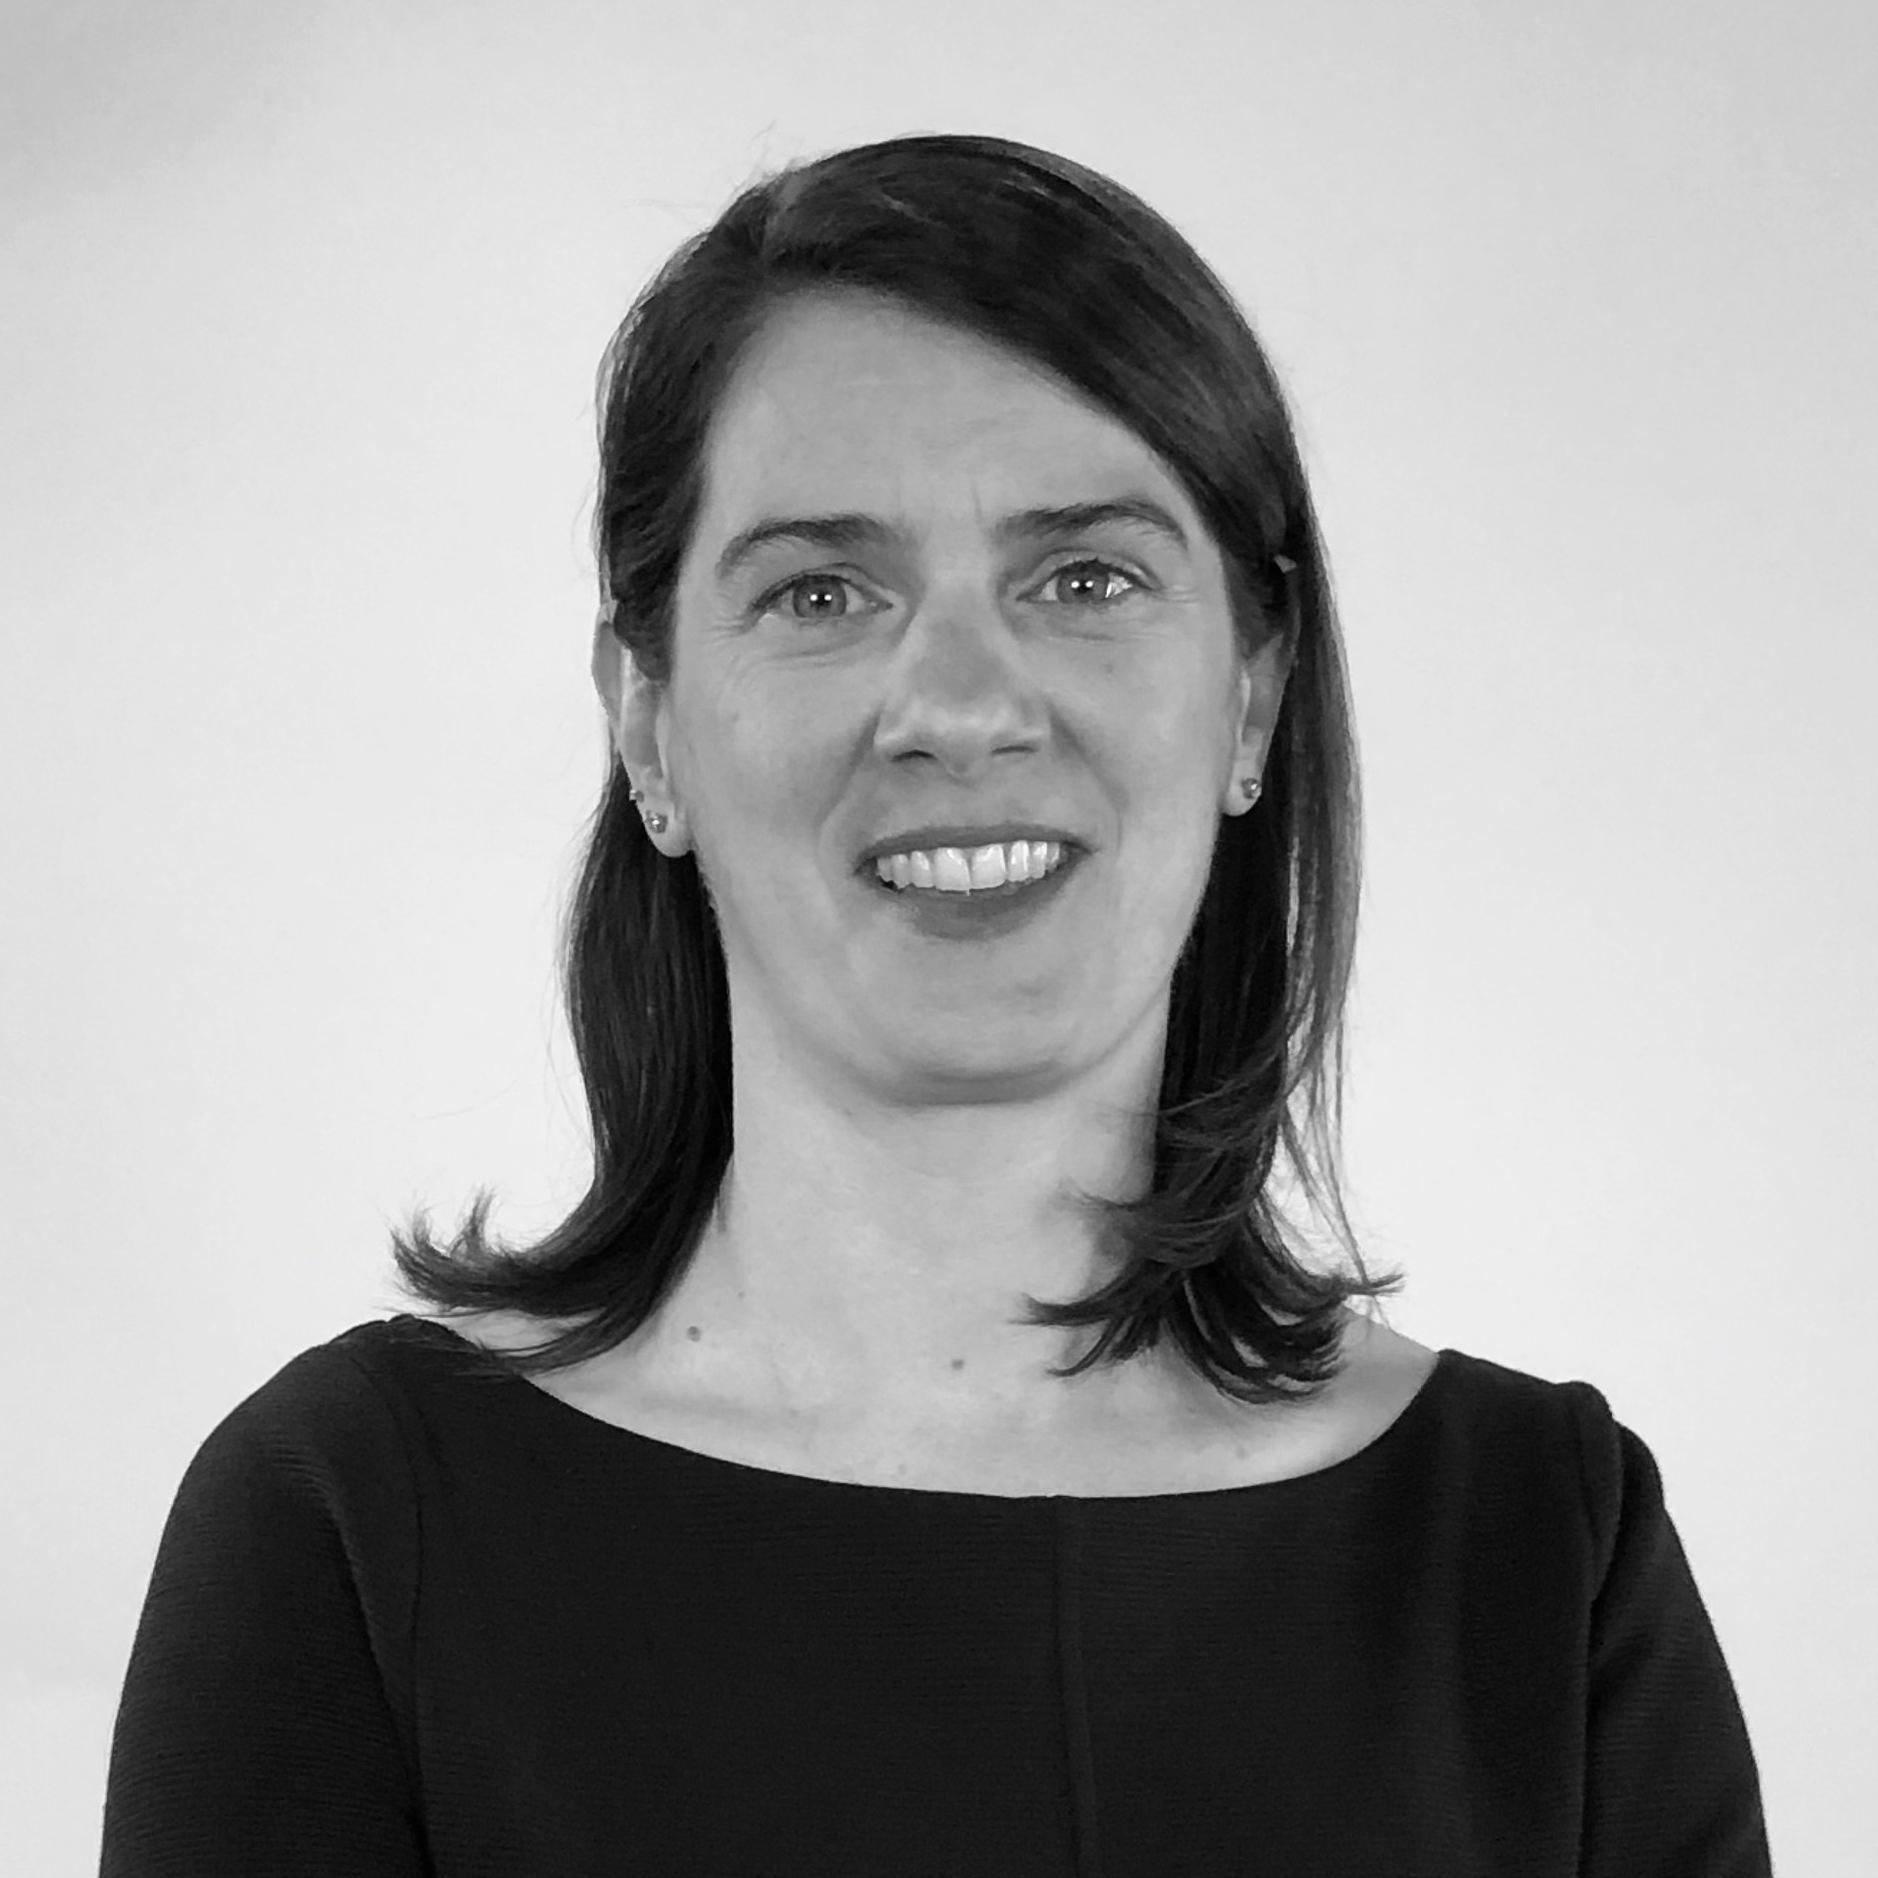 Rachel Bonfante